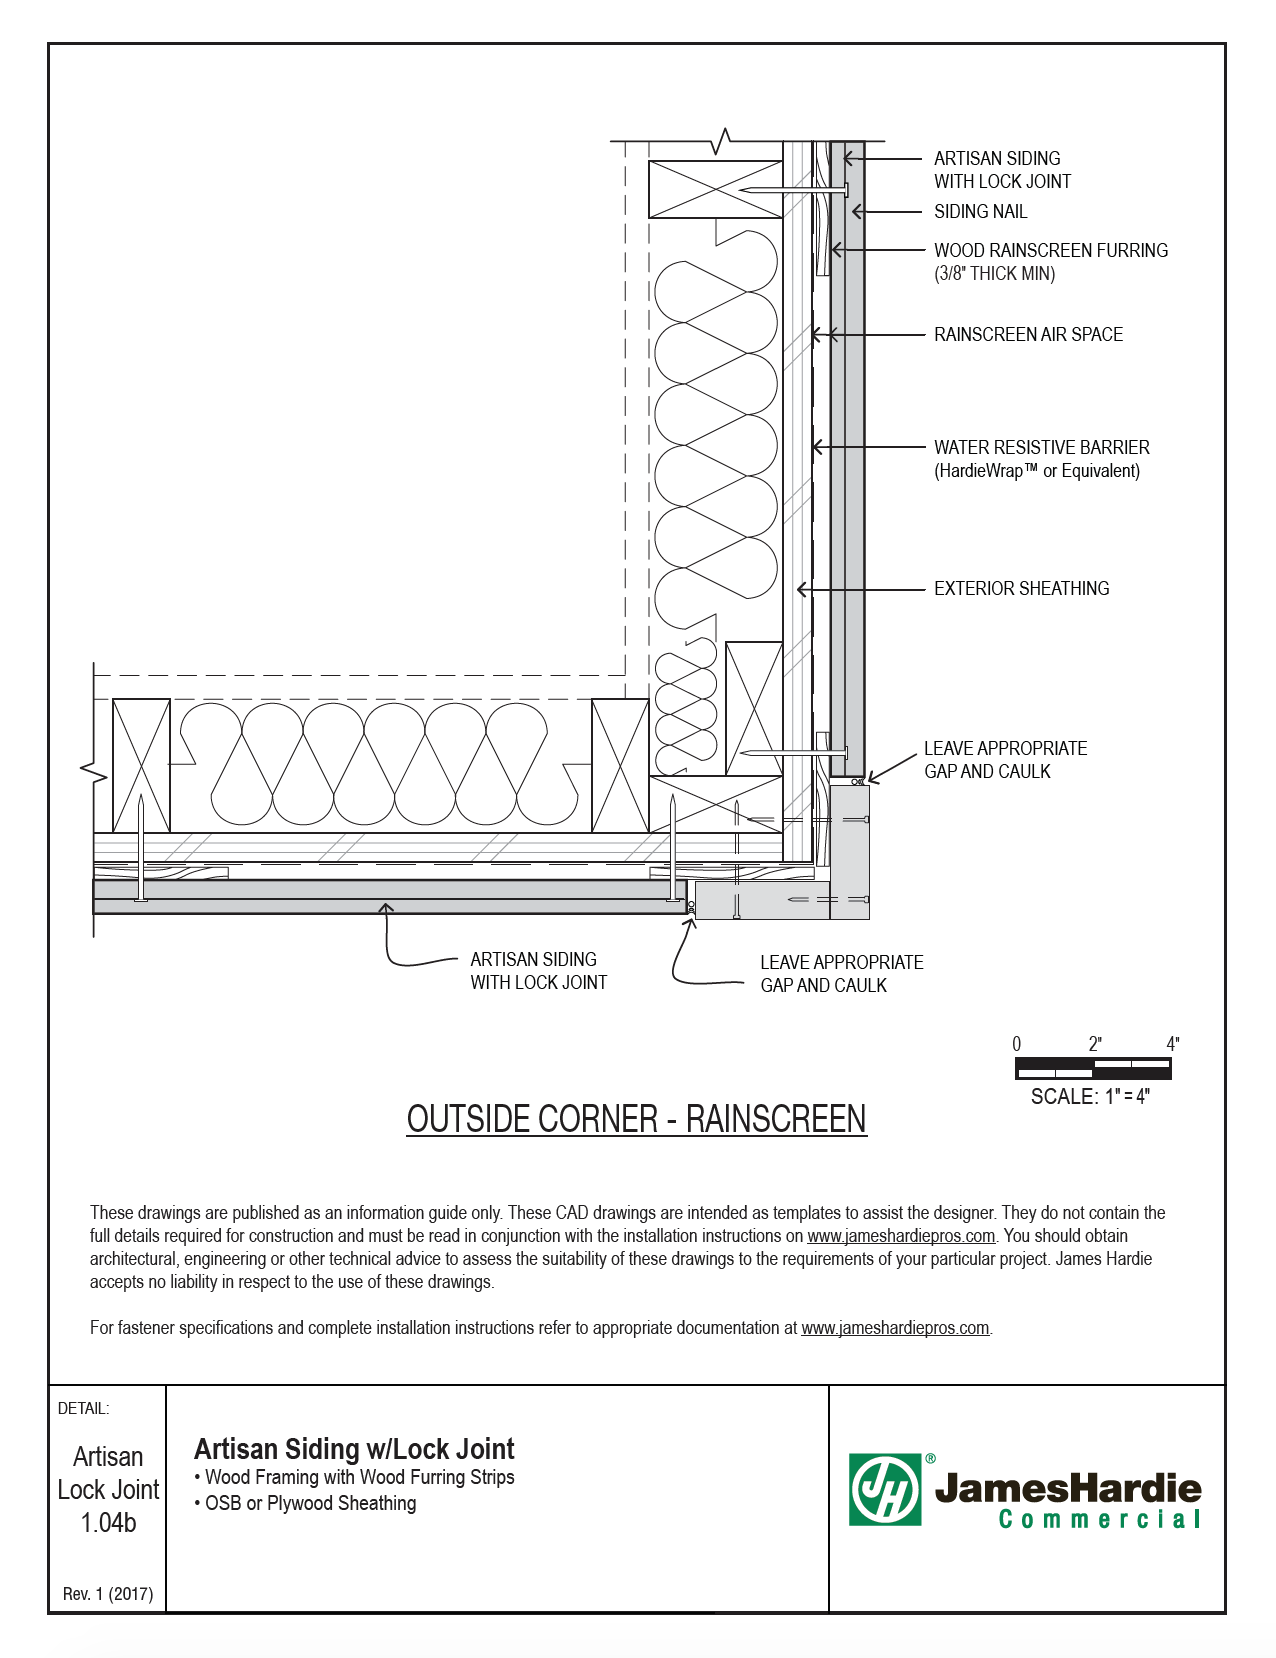 Image result for outside corner exterior insulation rainscreen detail